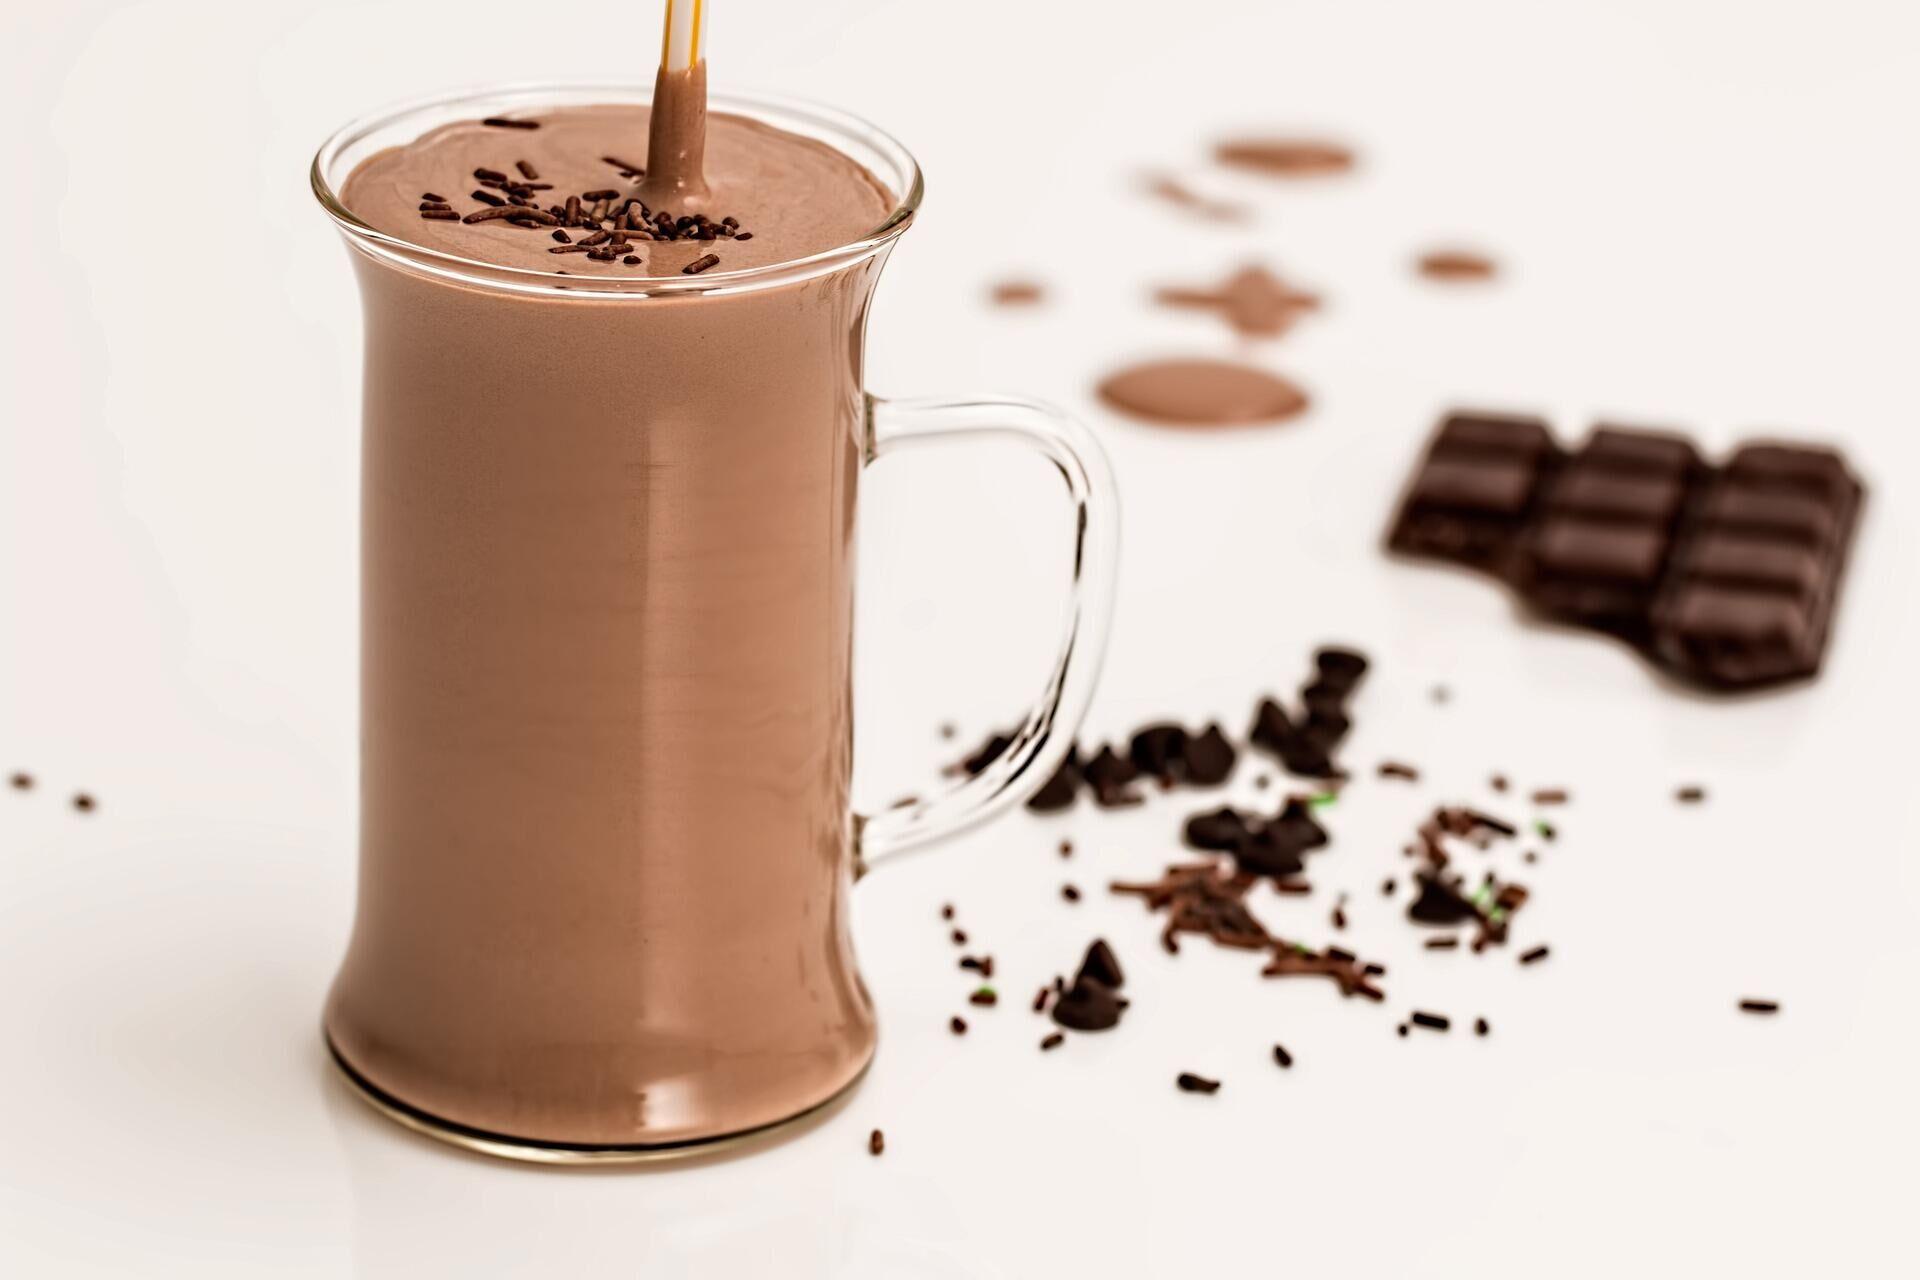 Чоколадно млеко - Sputnik Србија, 1920, 03.08.2021